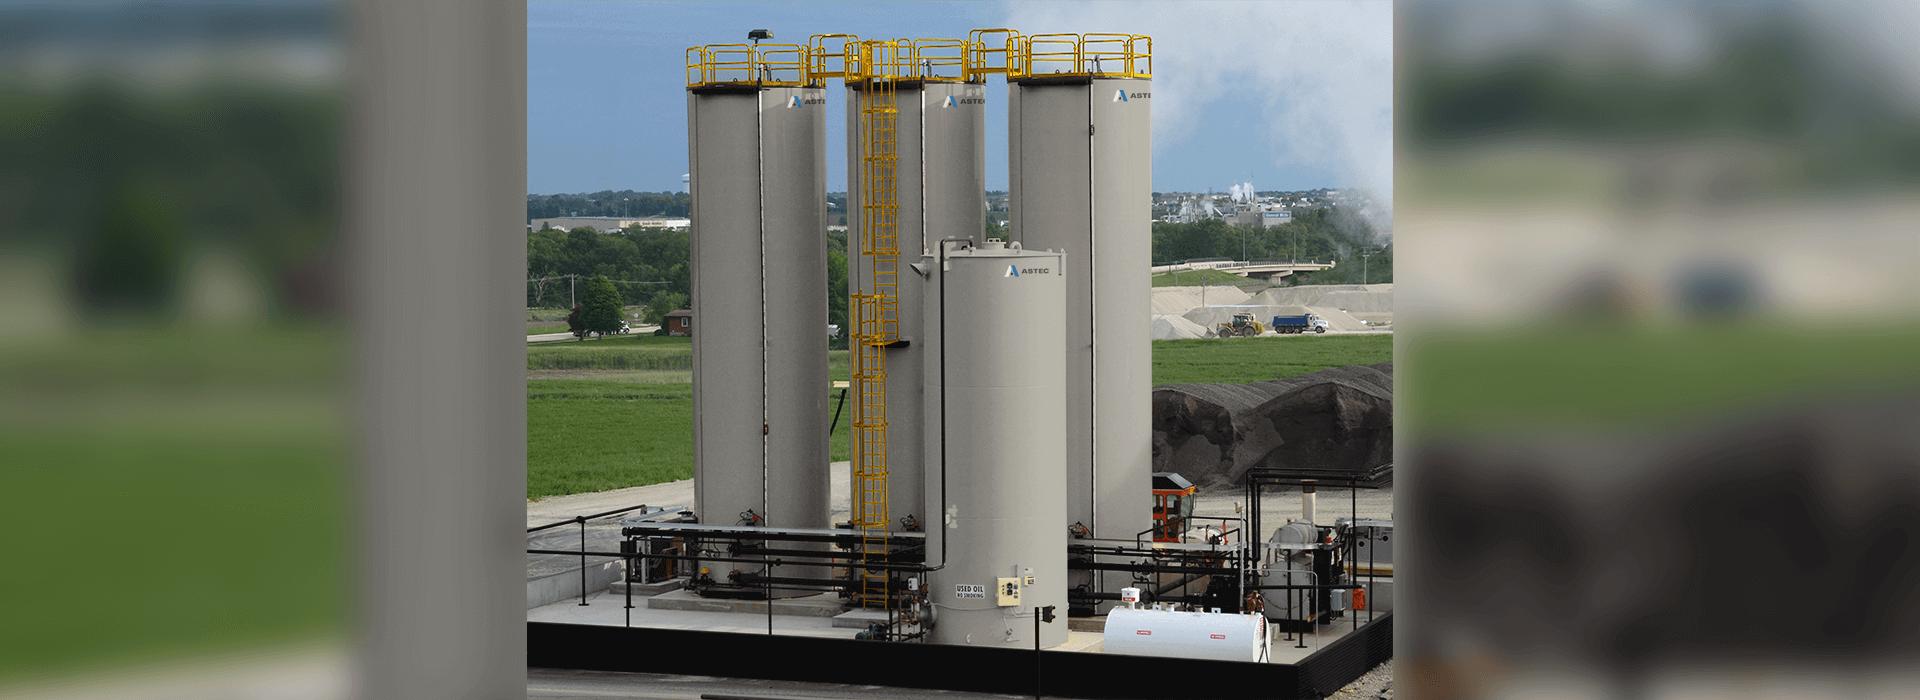 Heatec Thermoguard Storage Tanks